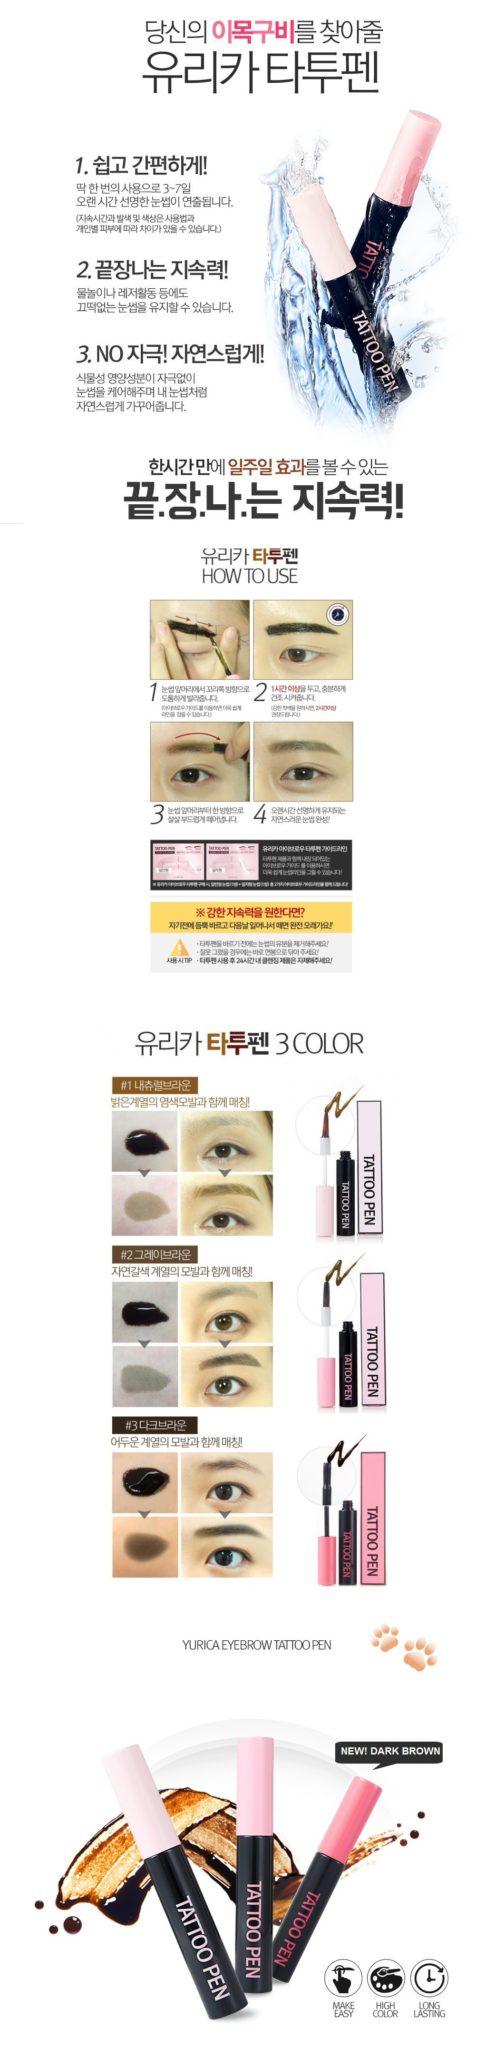 Yurica Tattoo Pen korean cosmetic makeup product online shop malaysia australia yemen1